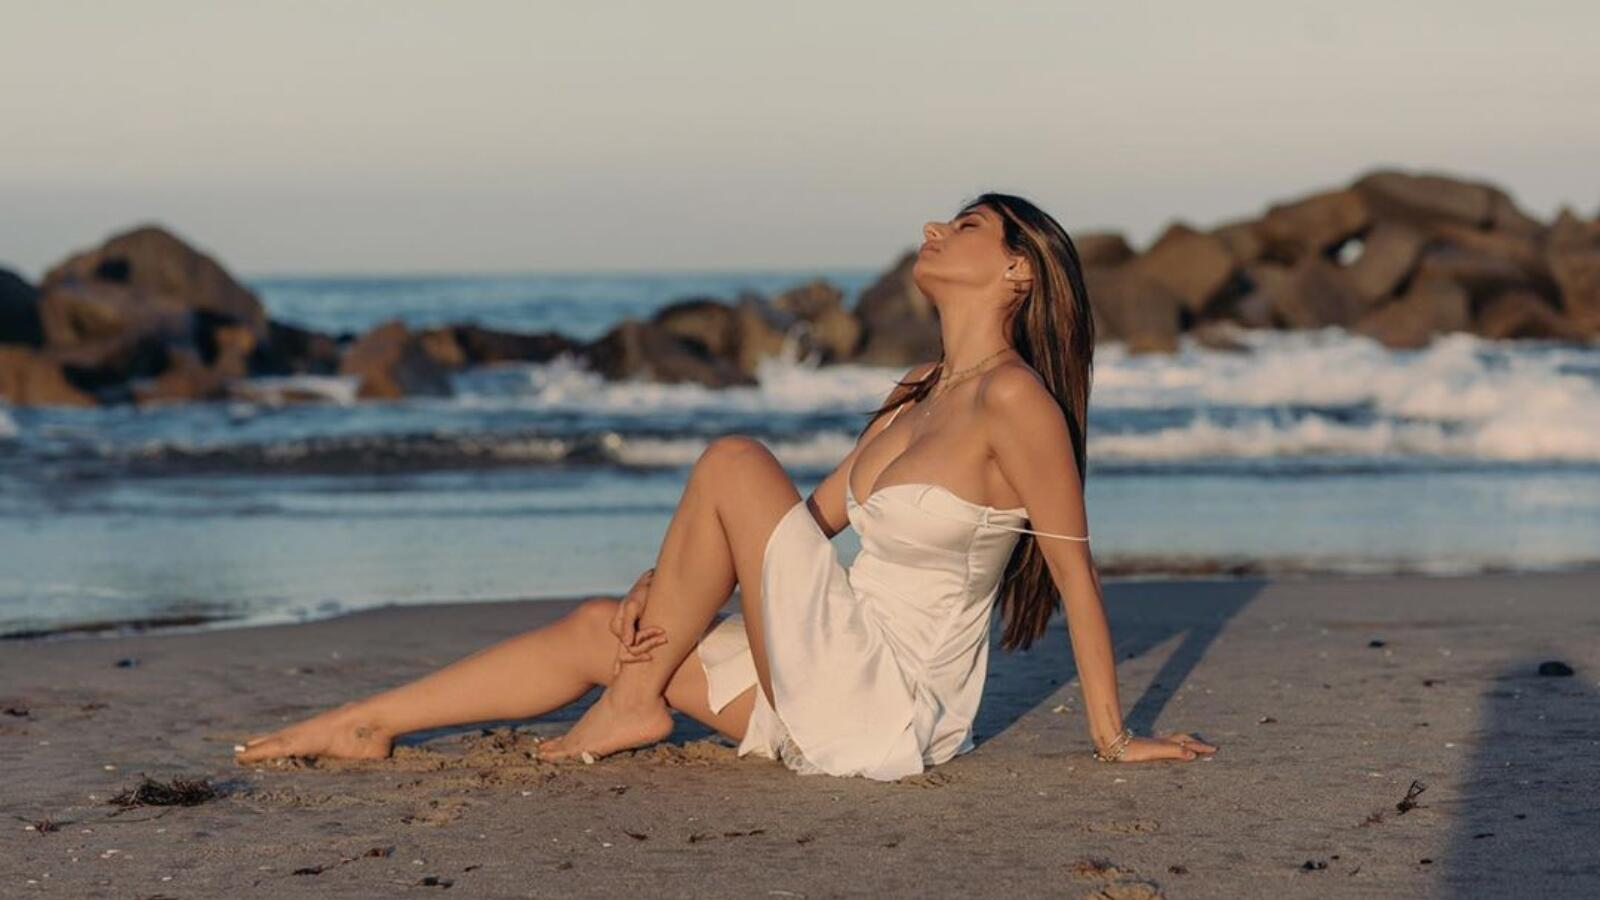 mia khalifa sexy beach 4k wallpaper 62086